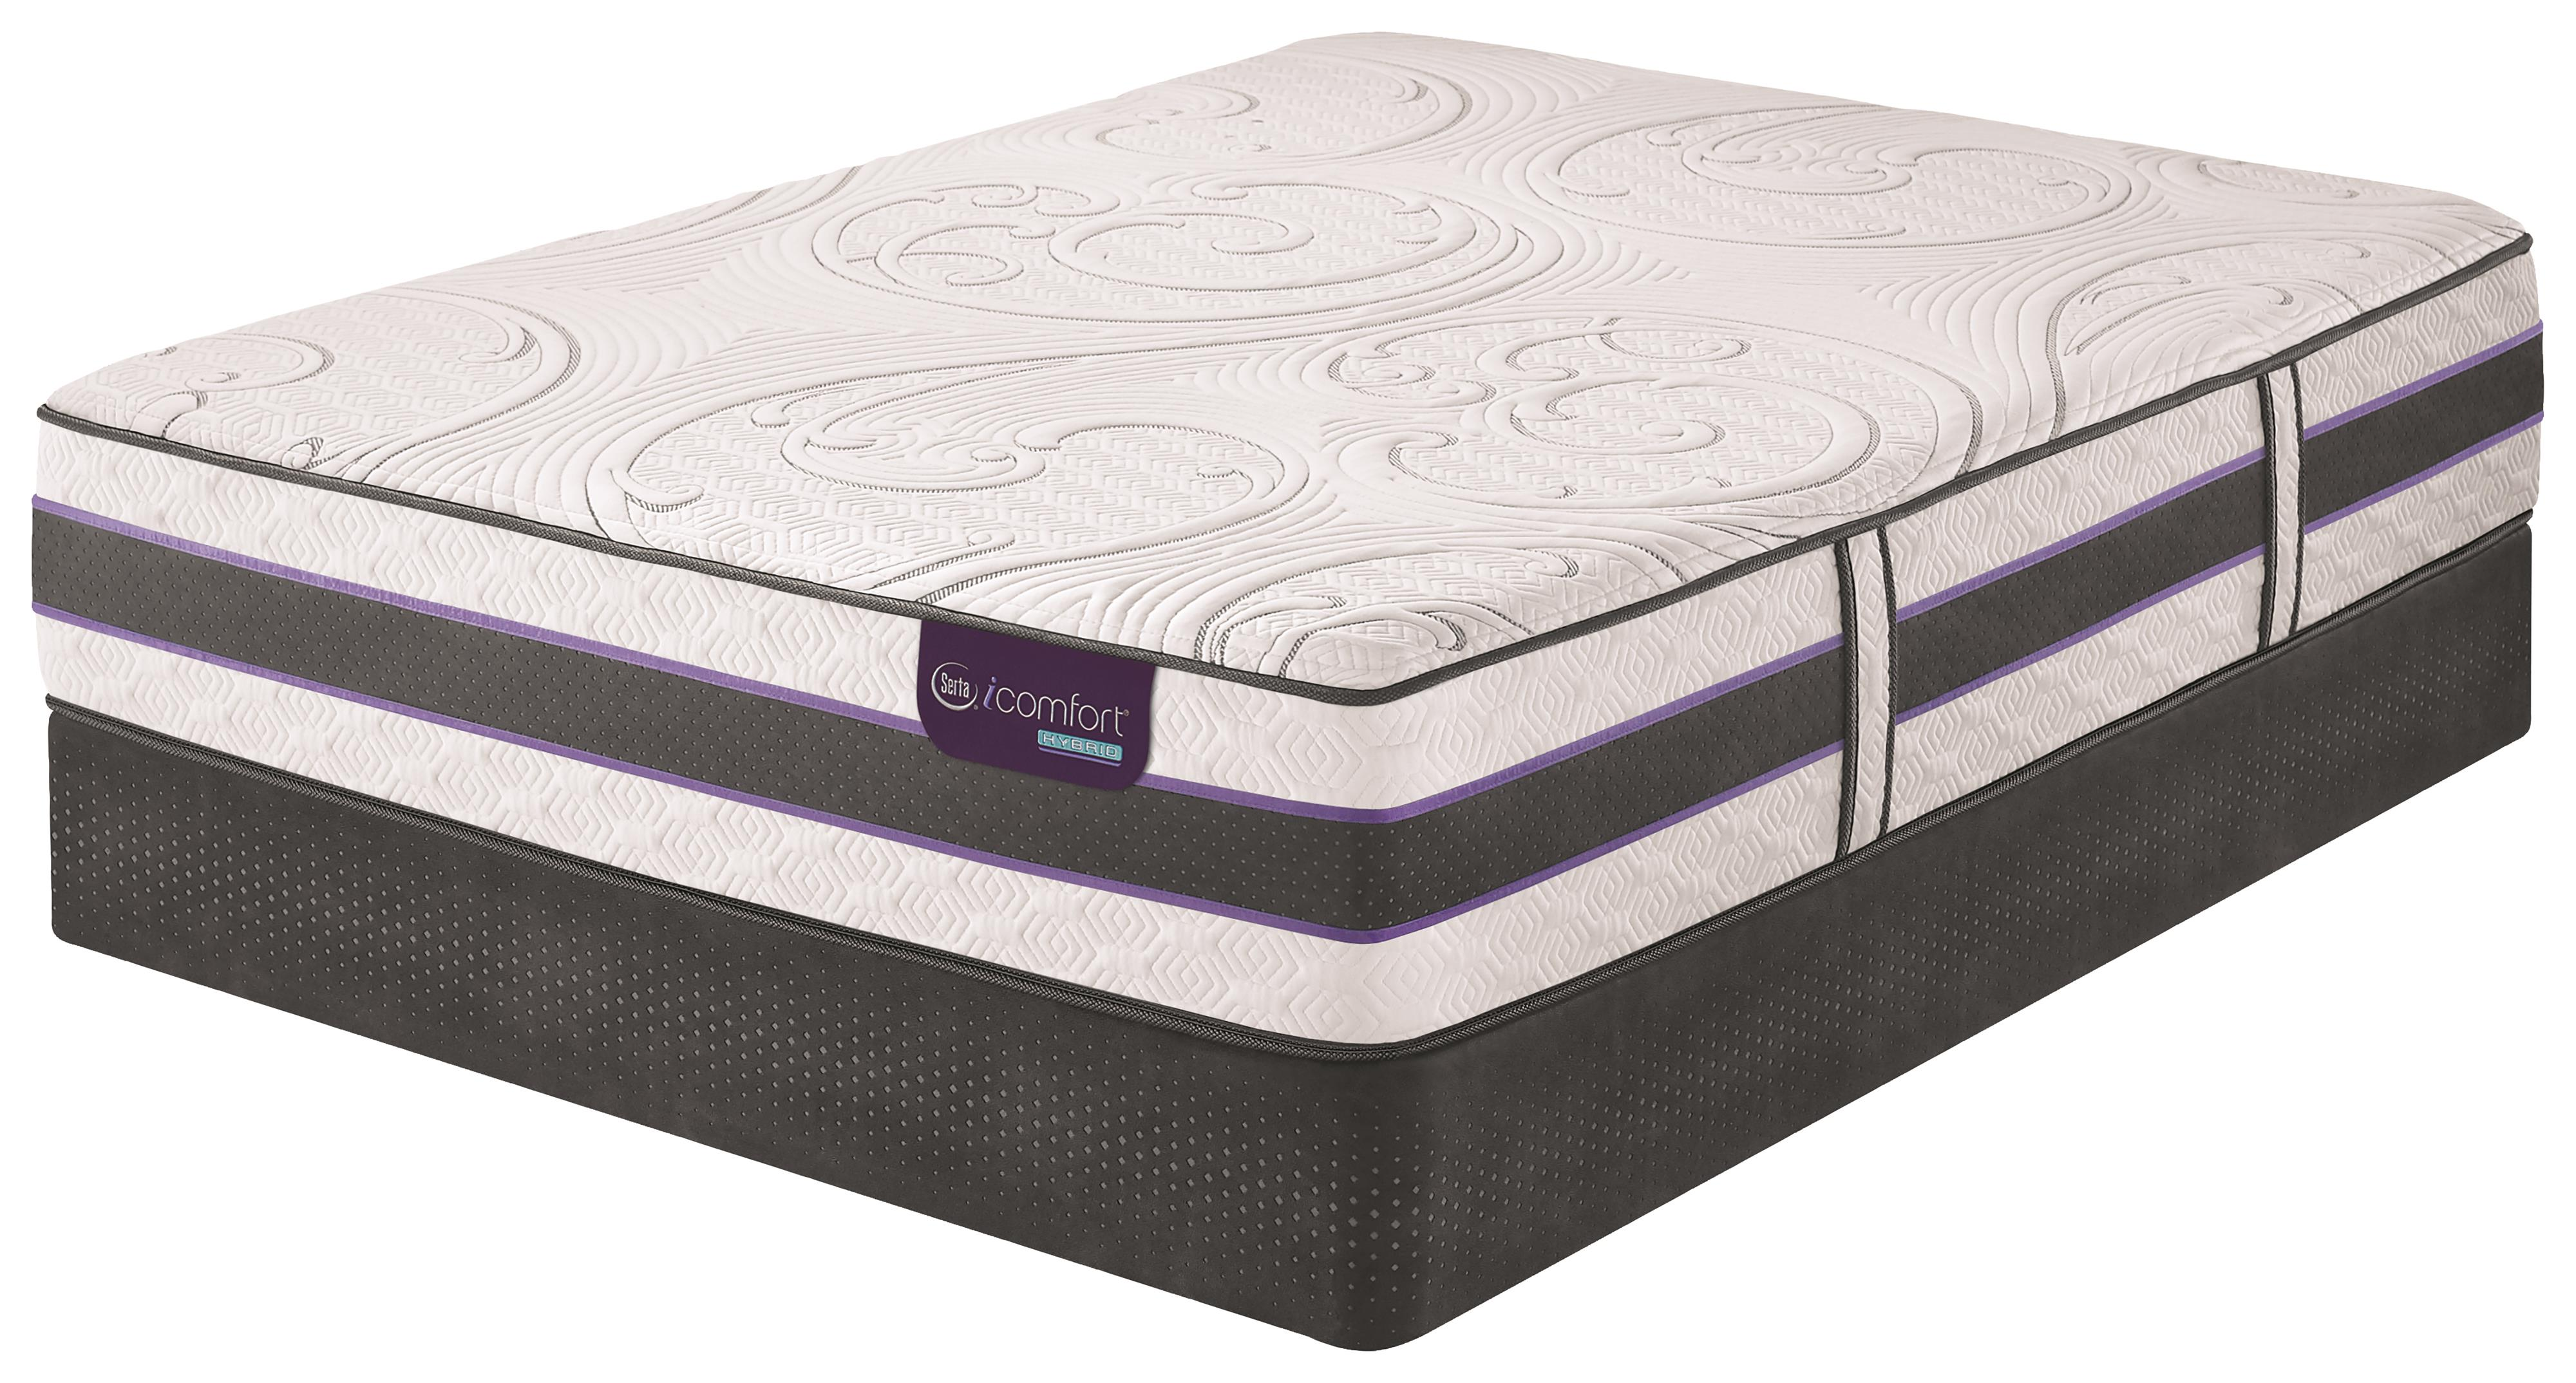 serta icomfort hybrid smartsupport hb300s hb300scf q pivotic q queen smartsupport hybrid. Black Bedroom Furniture Sets. Home Design Ideas